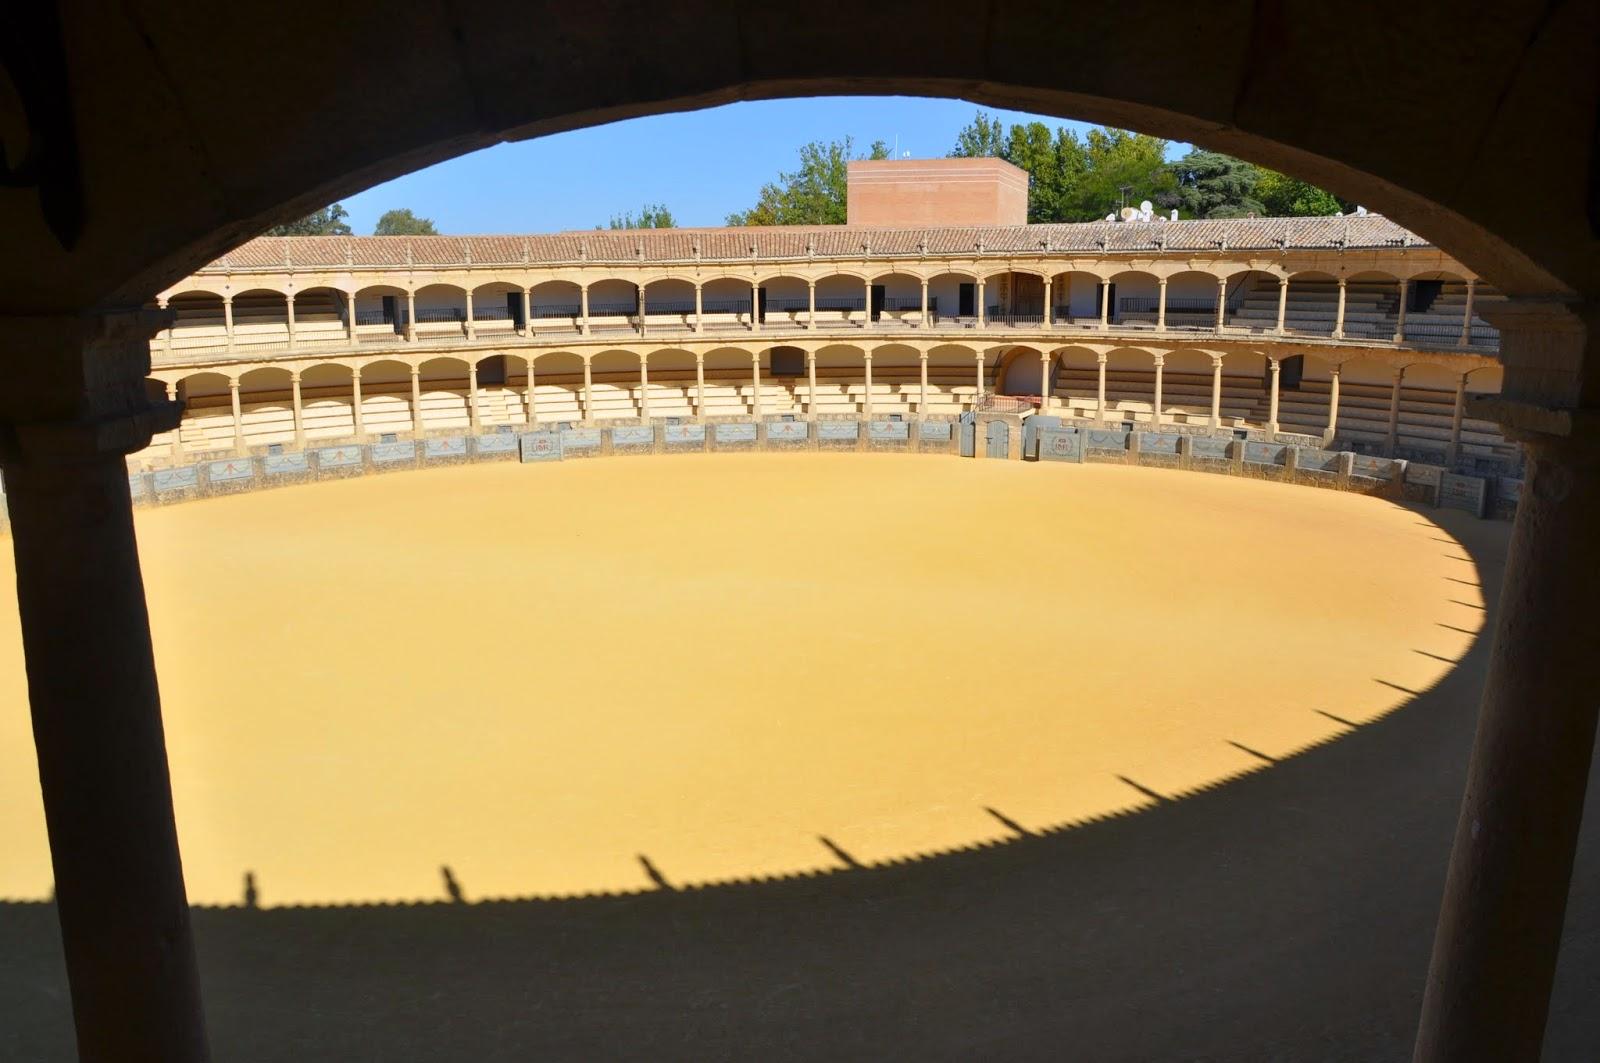 Itinerario in Spagna - Ronda